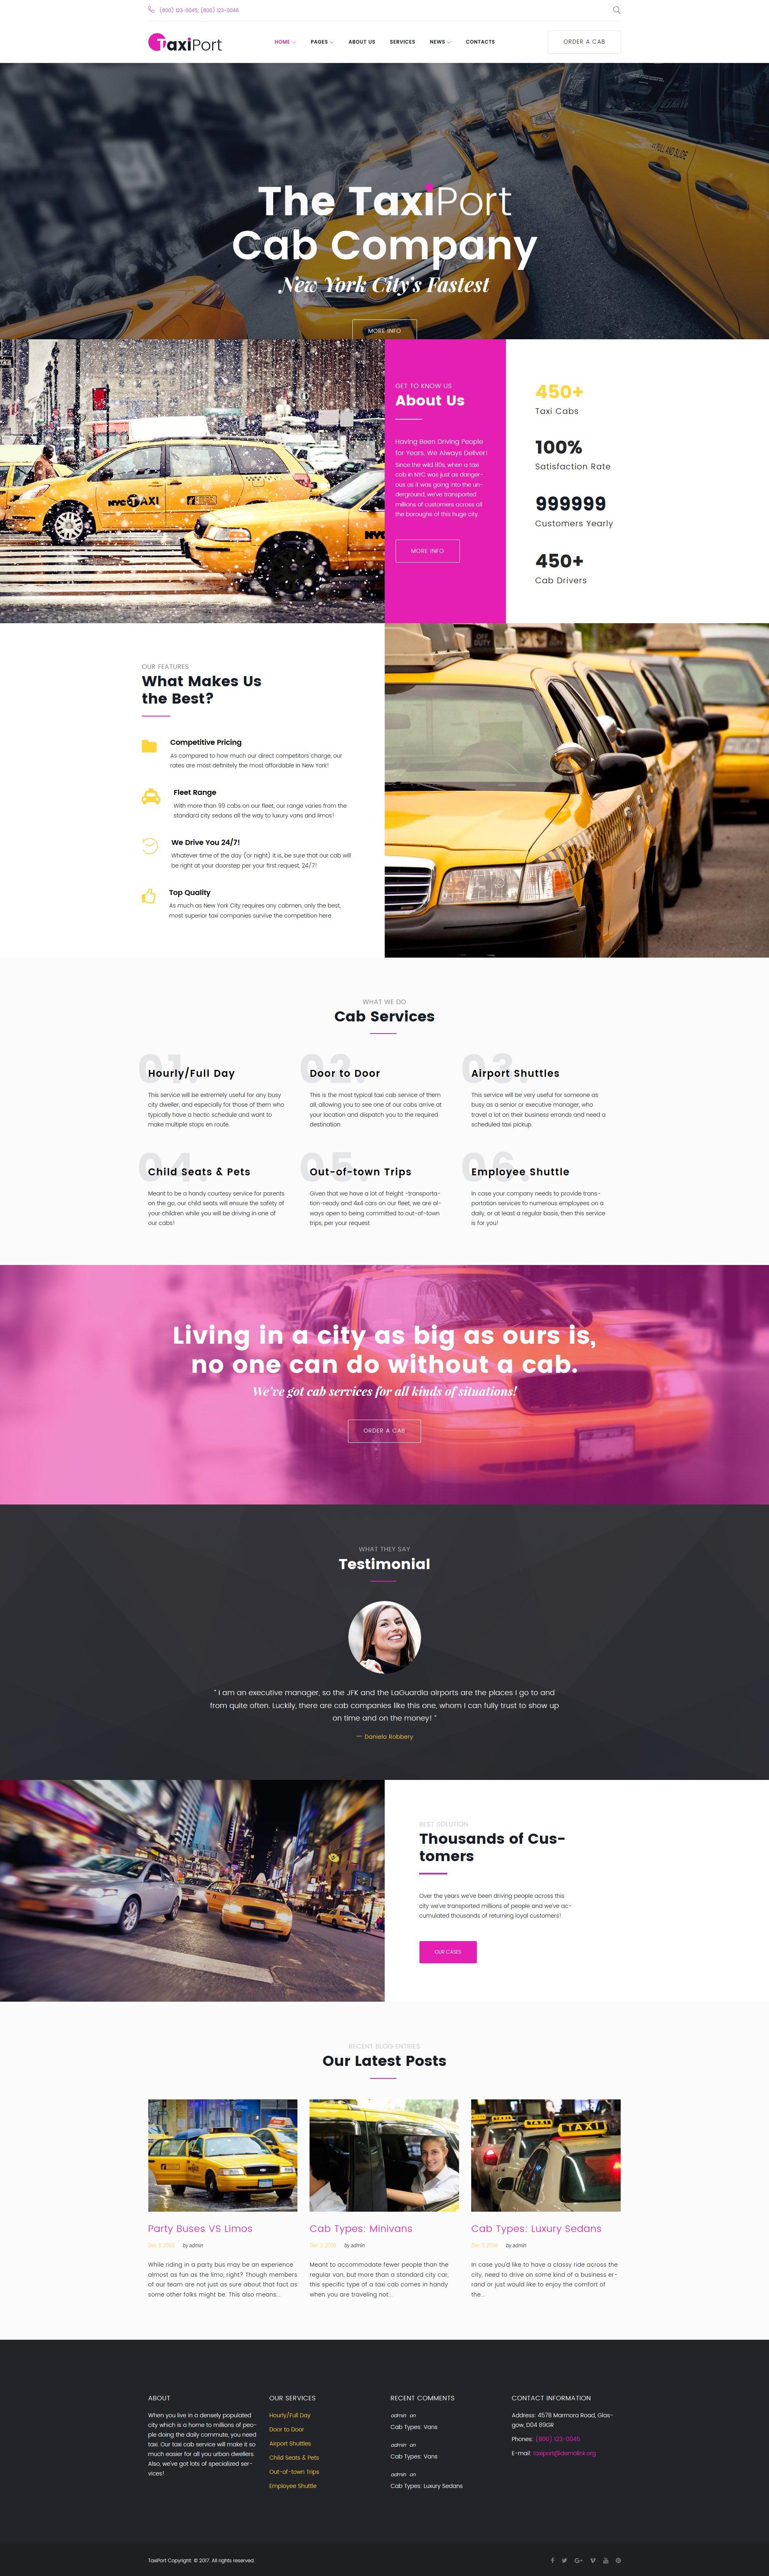 TaxiPort - Cab Company WordPress Theme